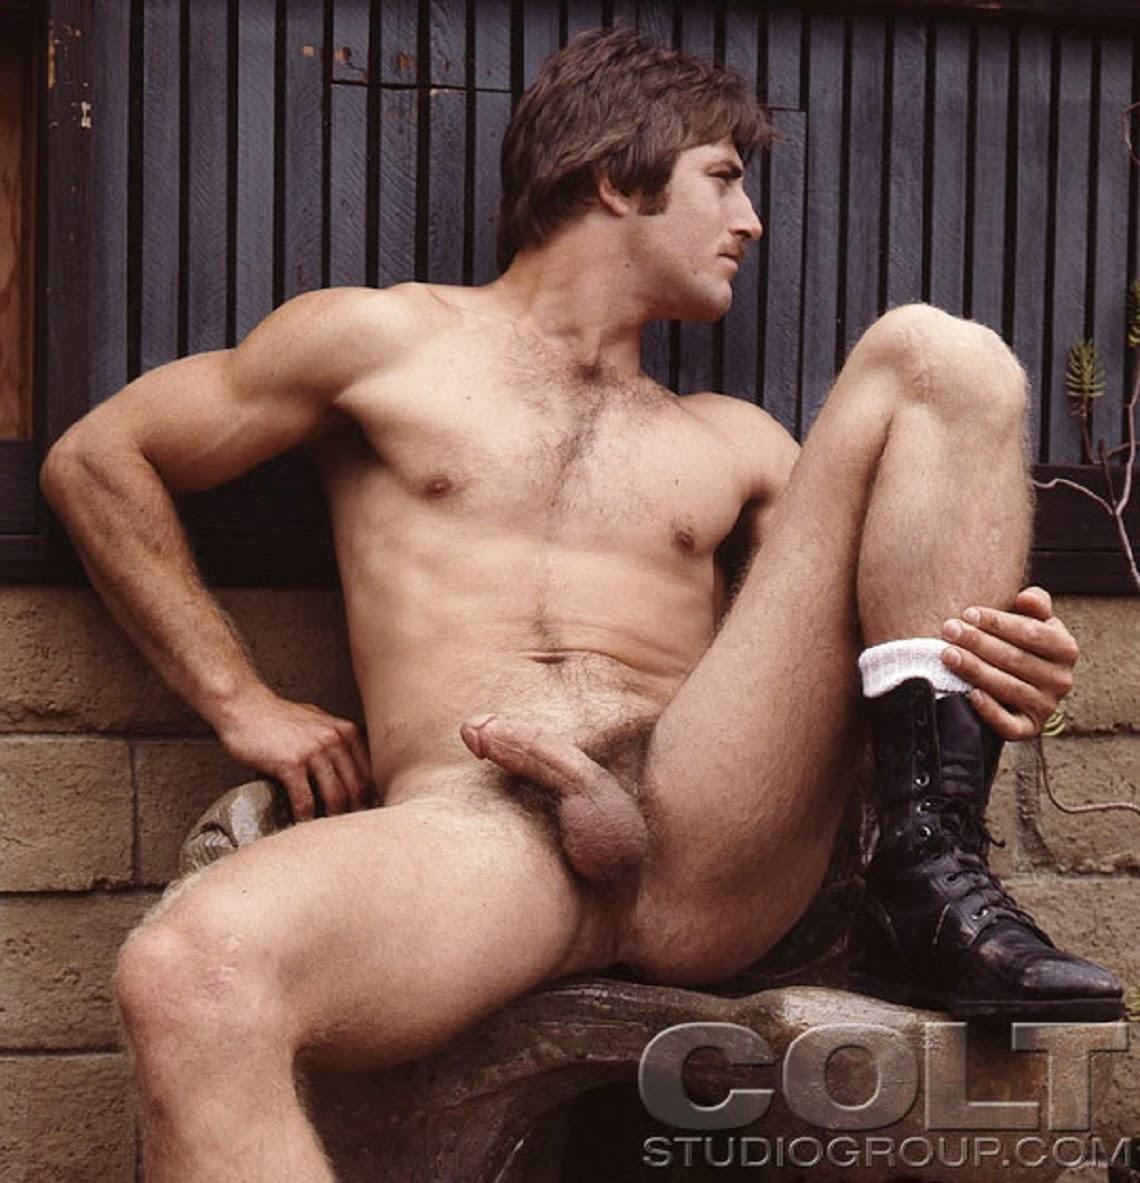 Venezuela male nude dick hot sweet young 8